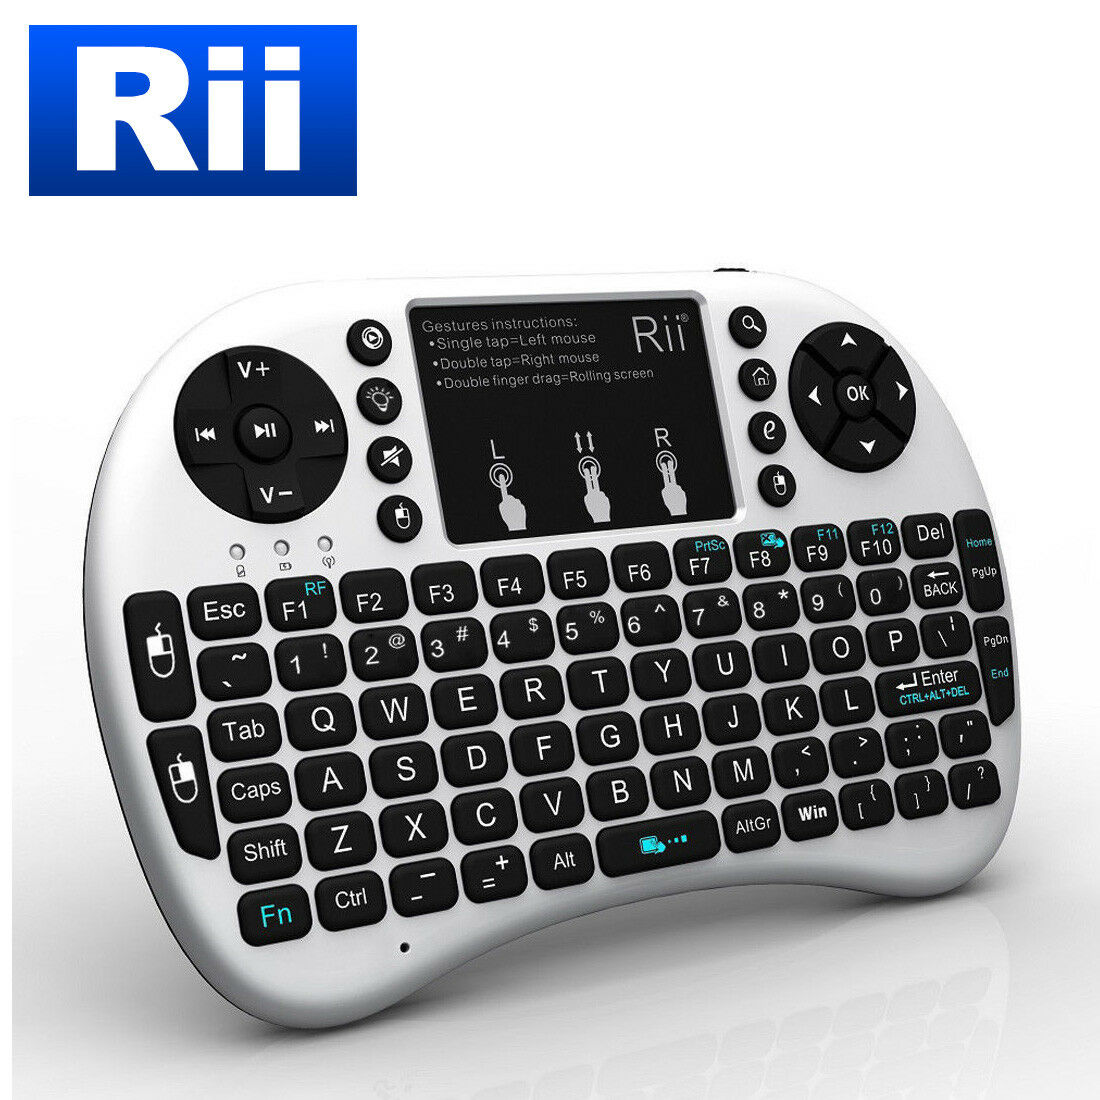 Details about Rii i8+ Mini Wireless Keyboard for PS4 Xbox 360 Kodi  Raspberry PI Android TV Box